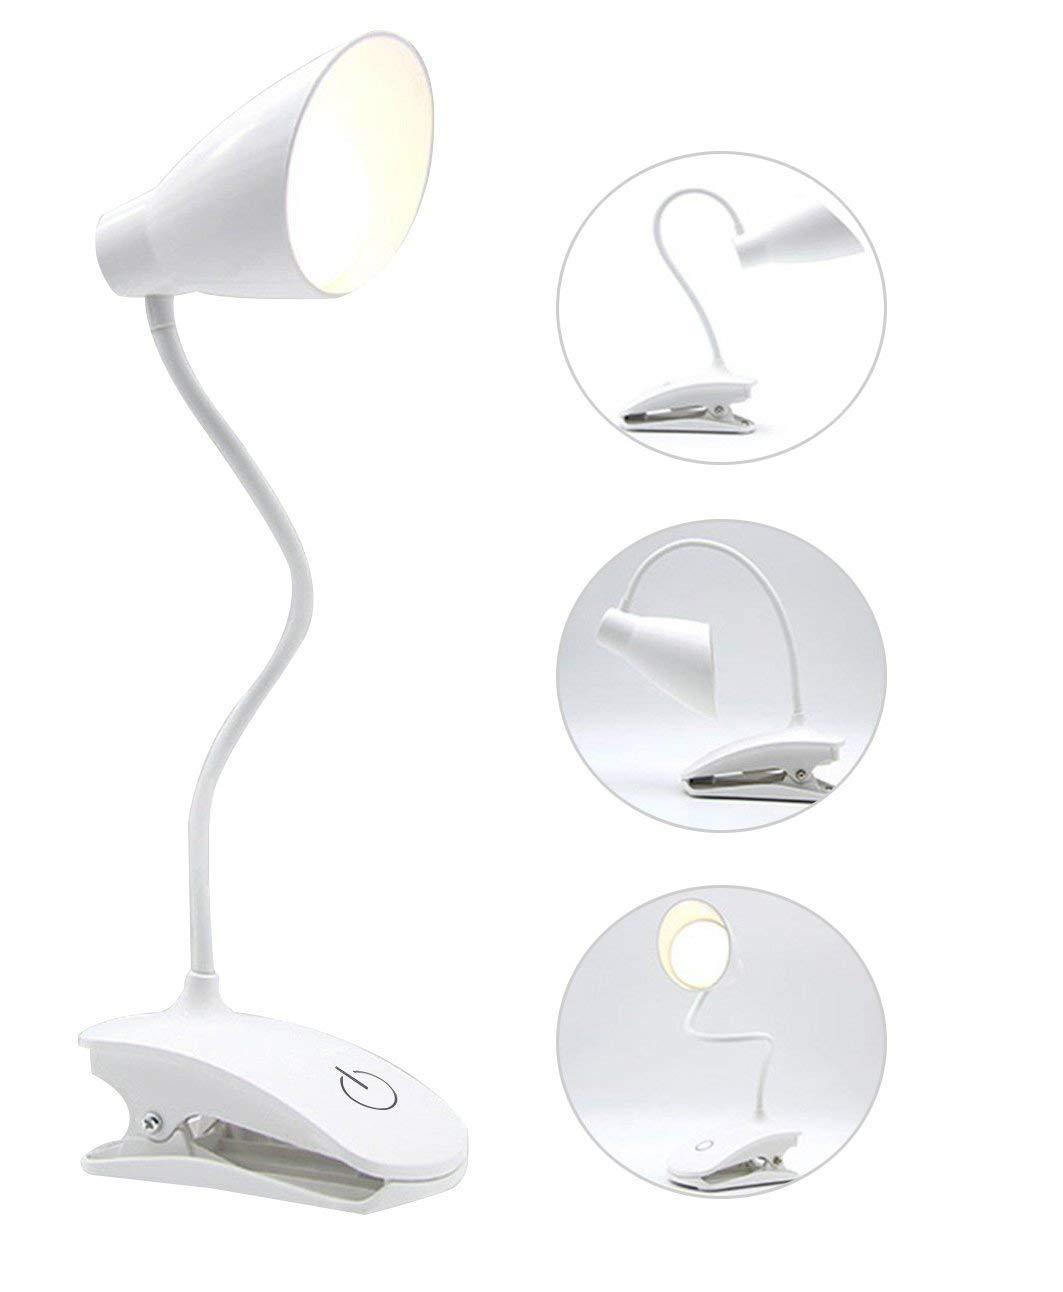 2019 12 Led Light Super Bright Desk Study Reading Table Pc Lamp Usb Battery Lamps Lighting Ceiling Fans Home Garden